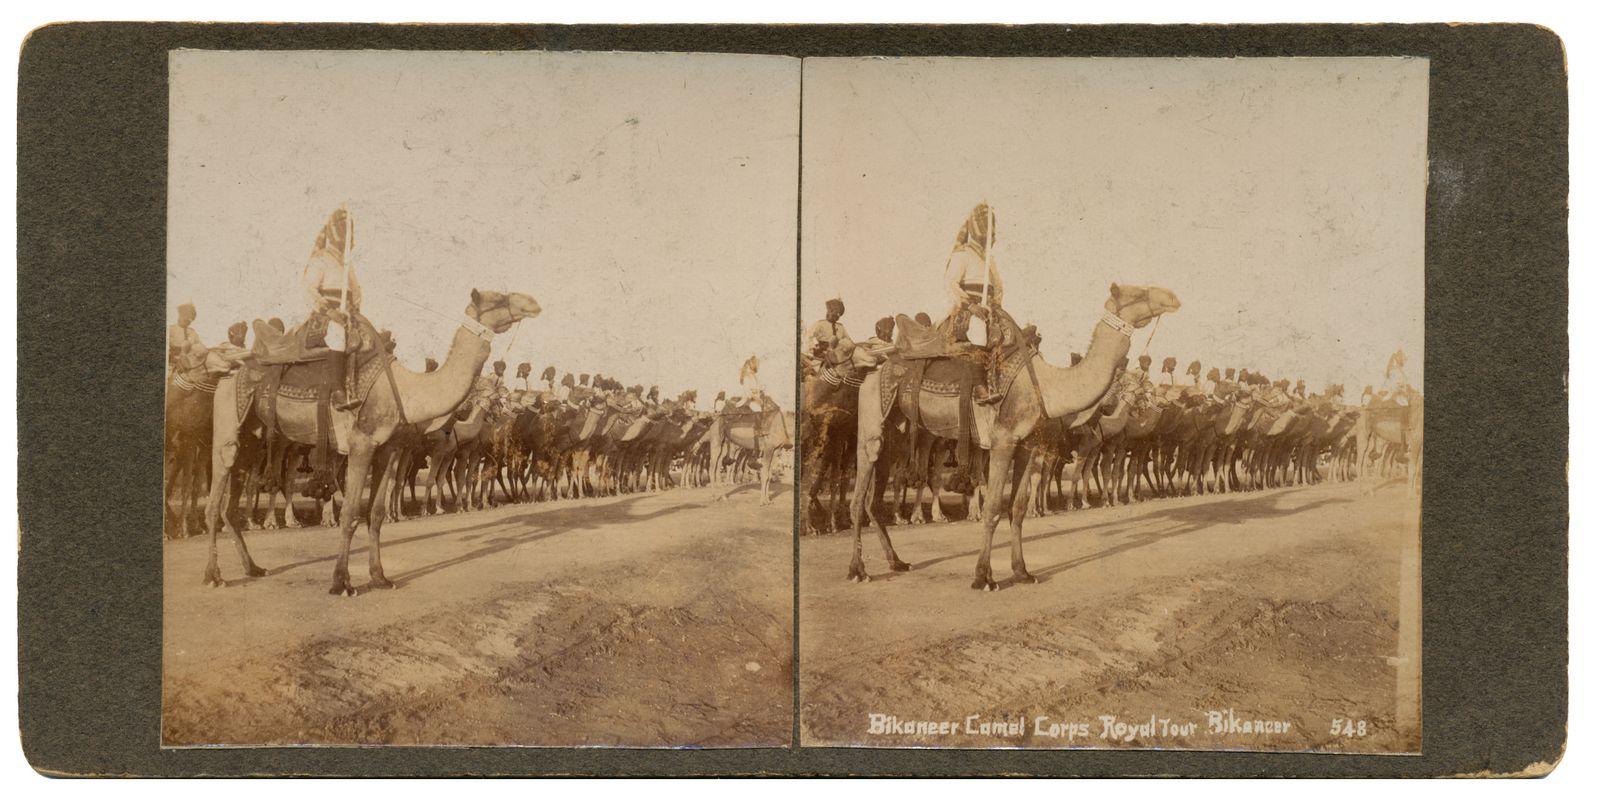 Bikaneer Camel Corps Royal Tour